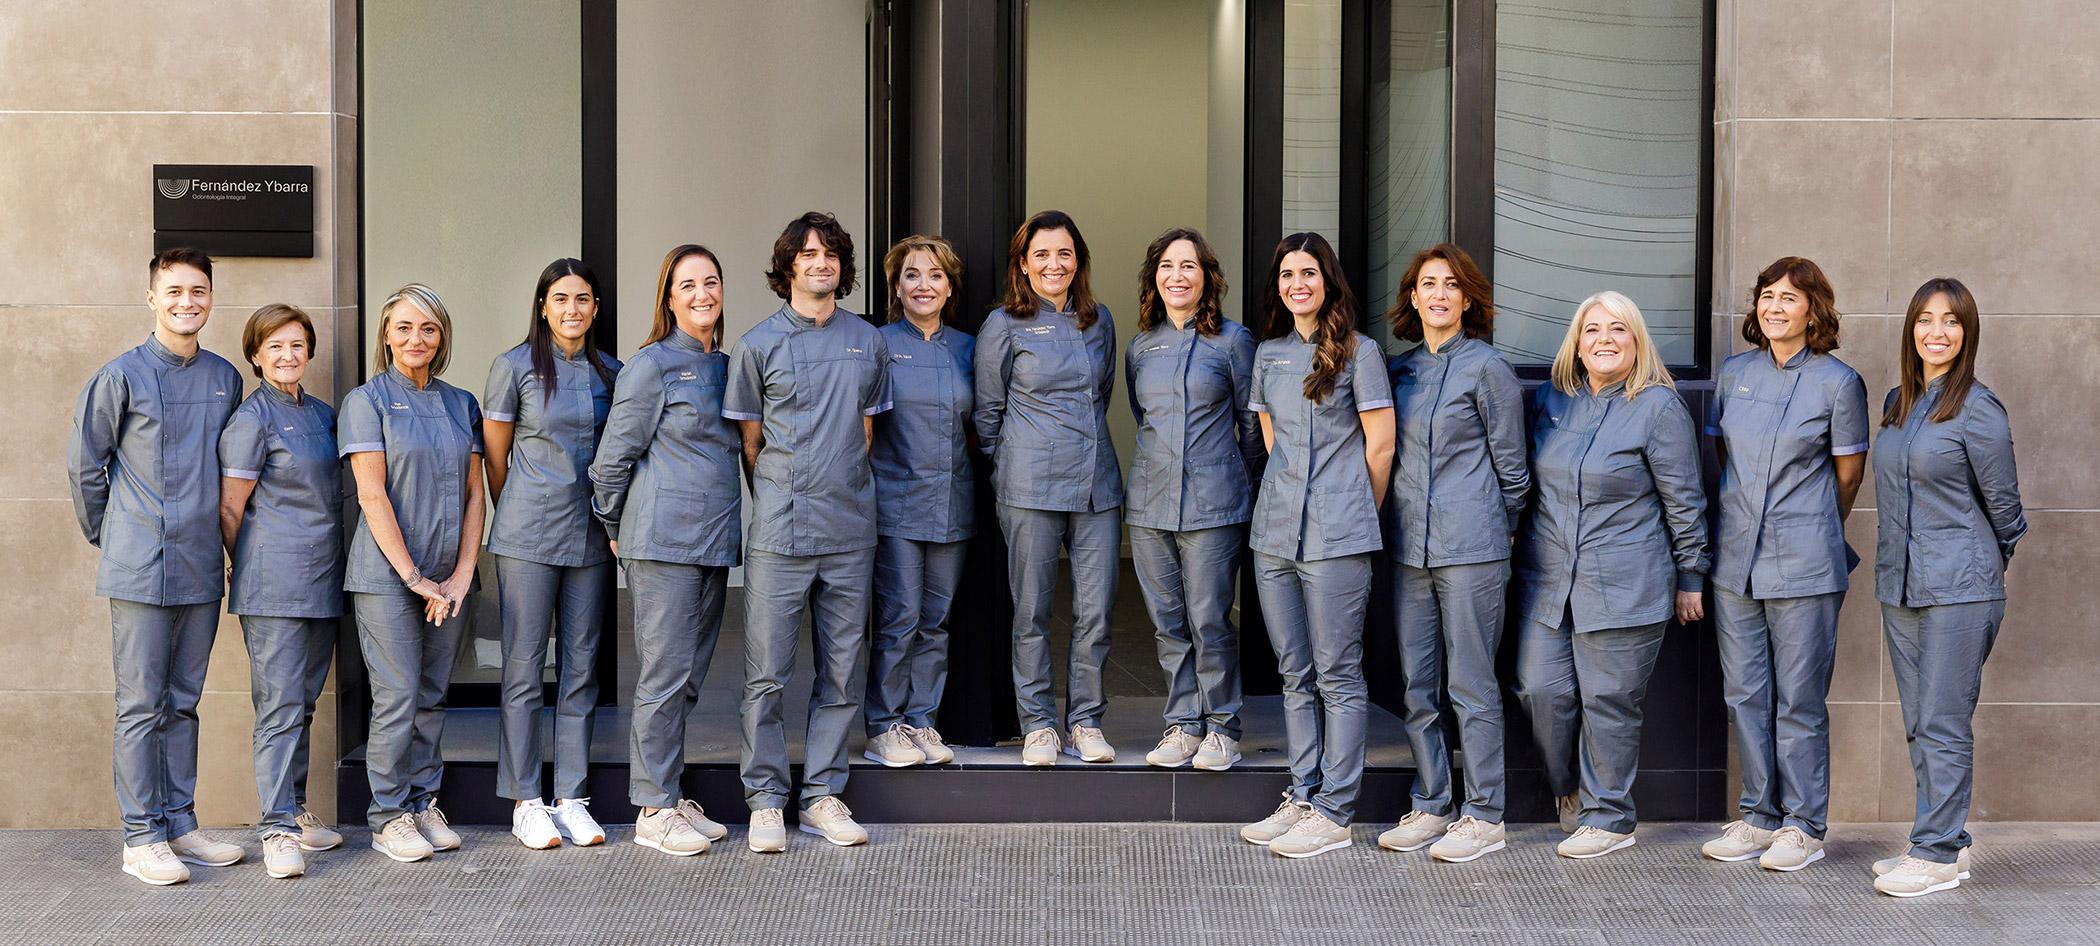 Equipo clinica dental fernandez ybarra